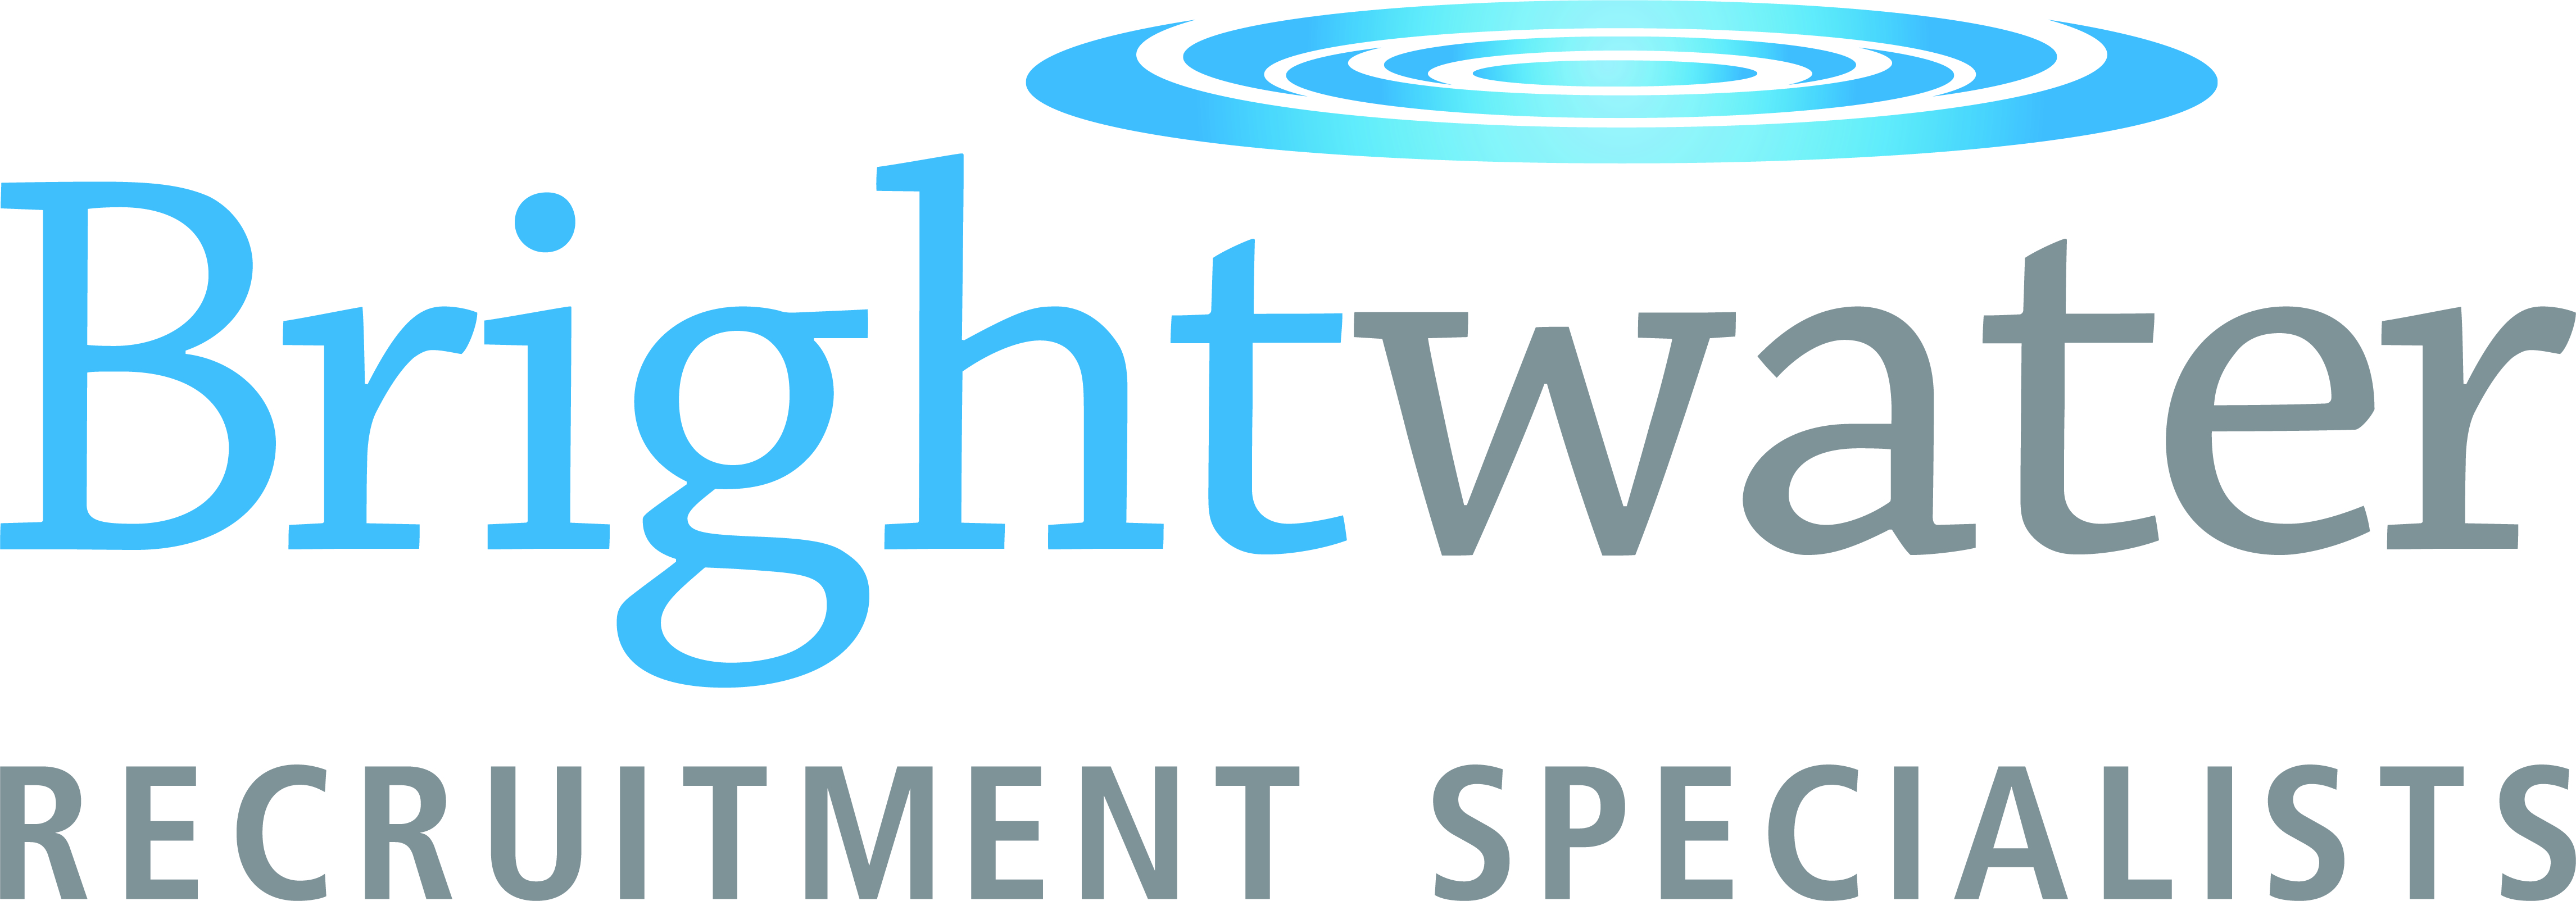 Brightwater Recruitment Consultants